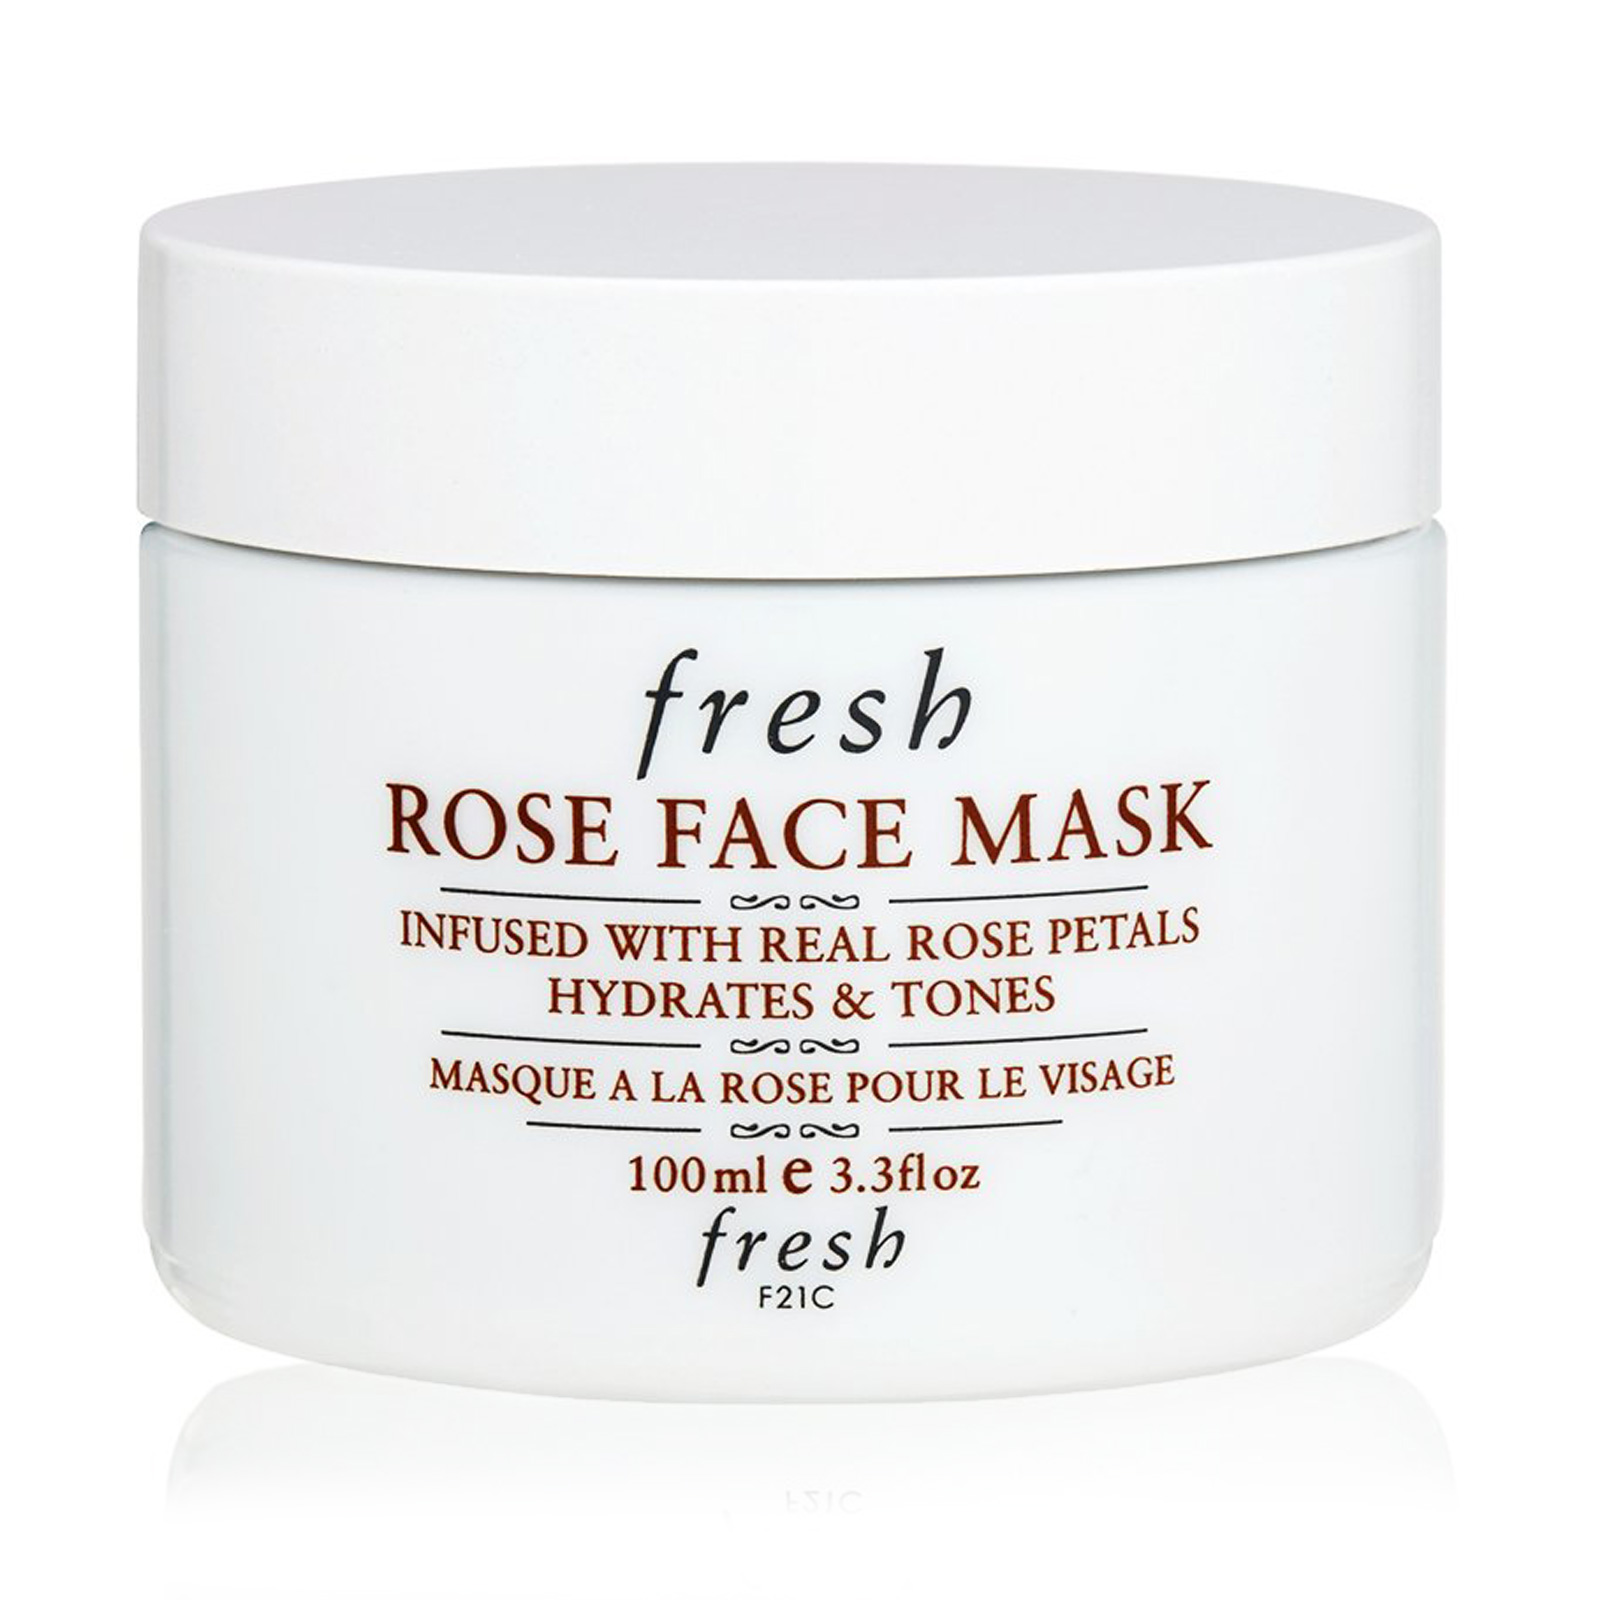 Rose Face Mask (For All Skin Types)